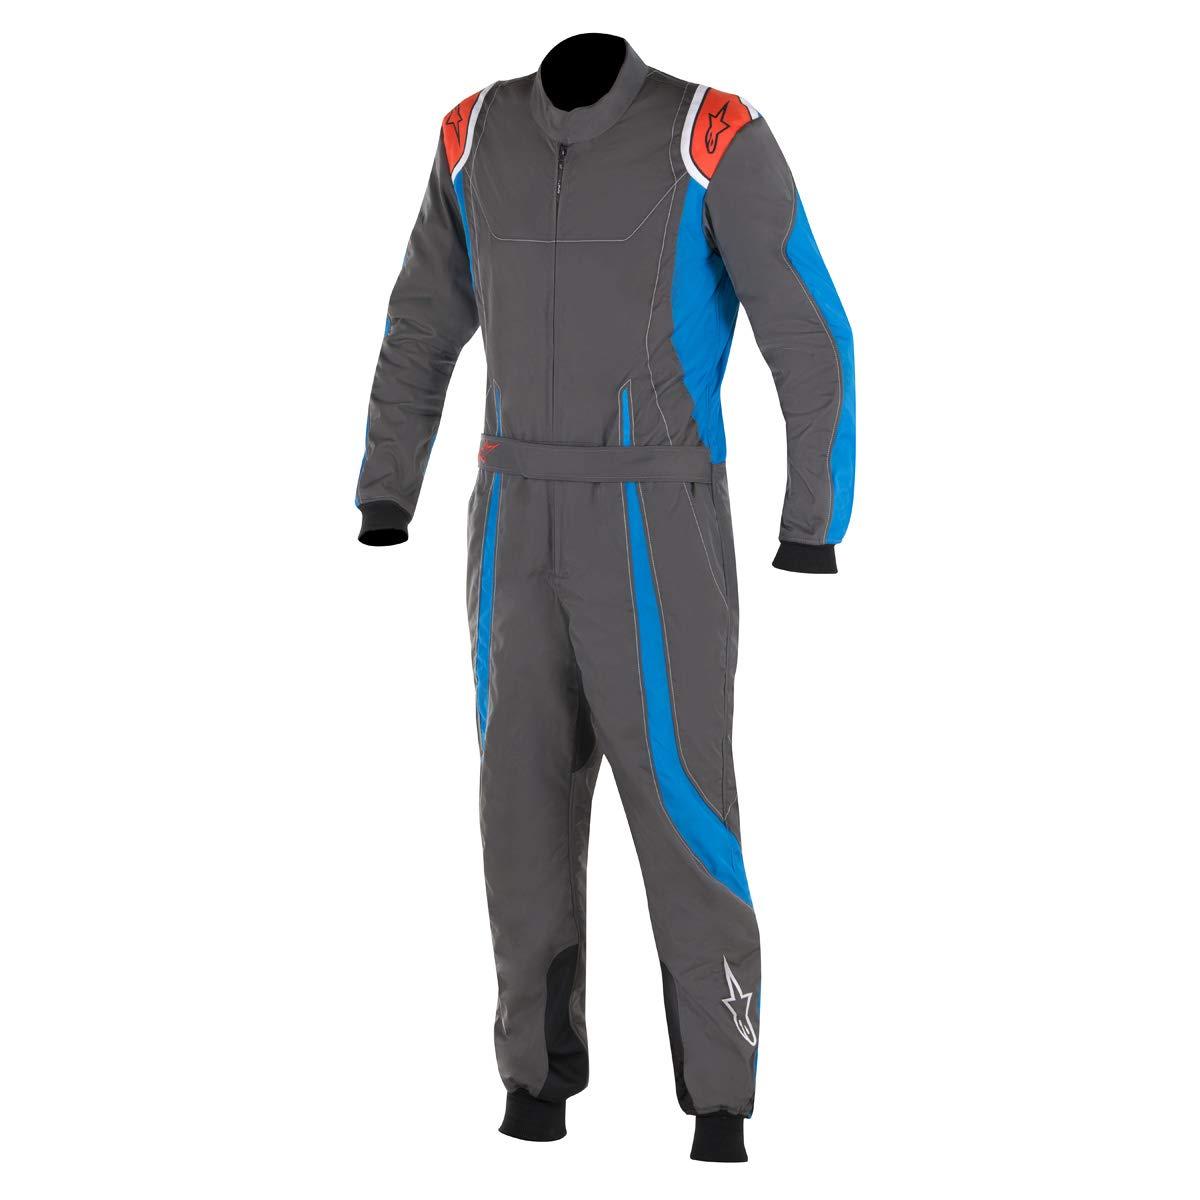 Alpinestars 3356017-1754-52 K-MX 9 Suit, Anthracite/Blue/Red Fluorescent, Size 52, CIK FIA Level 2, 3-Layer